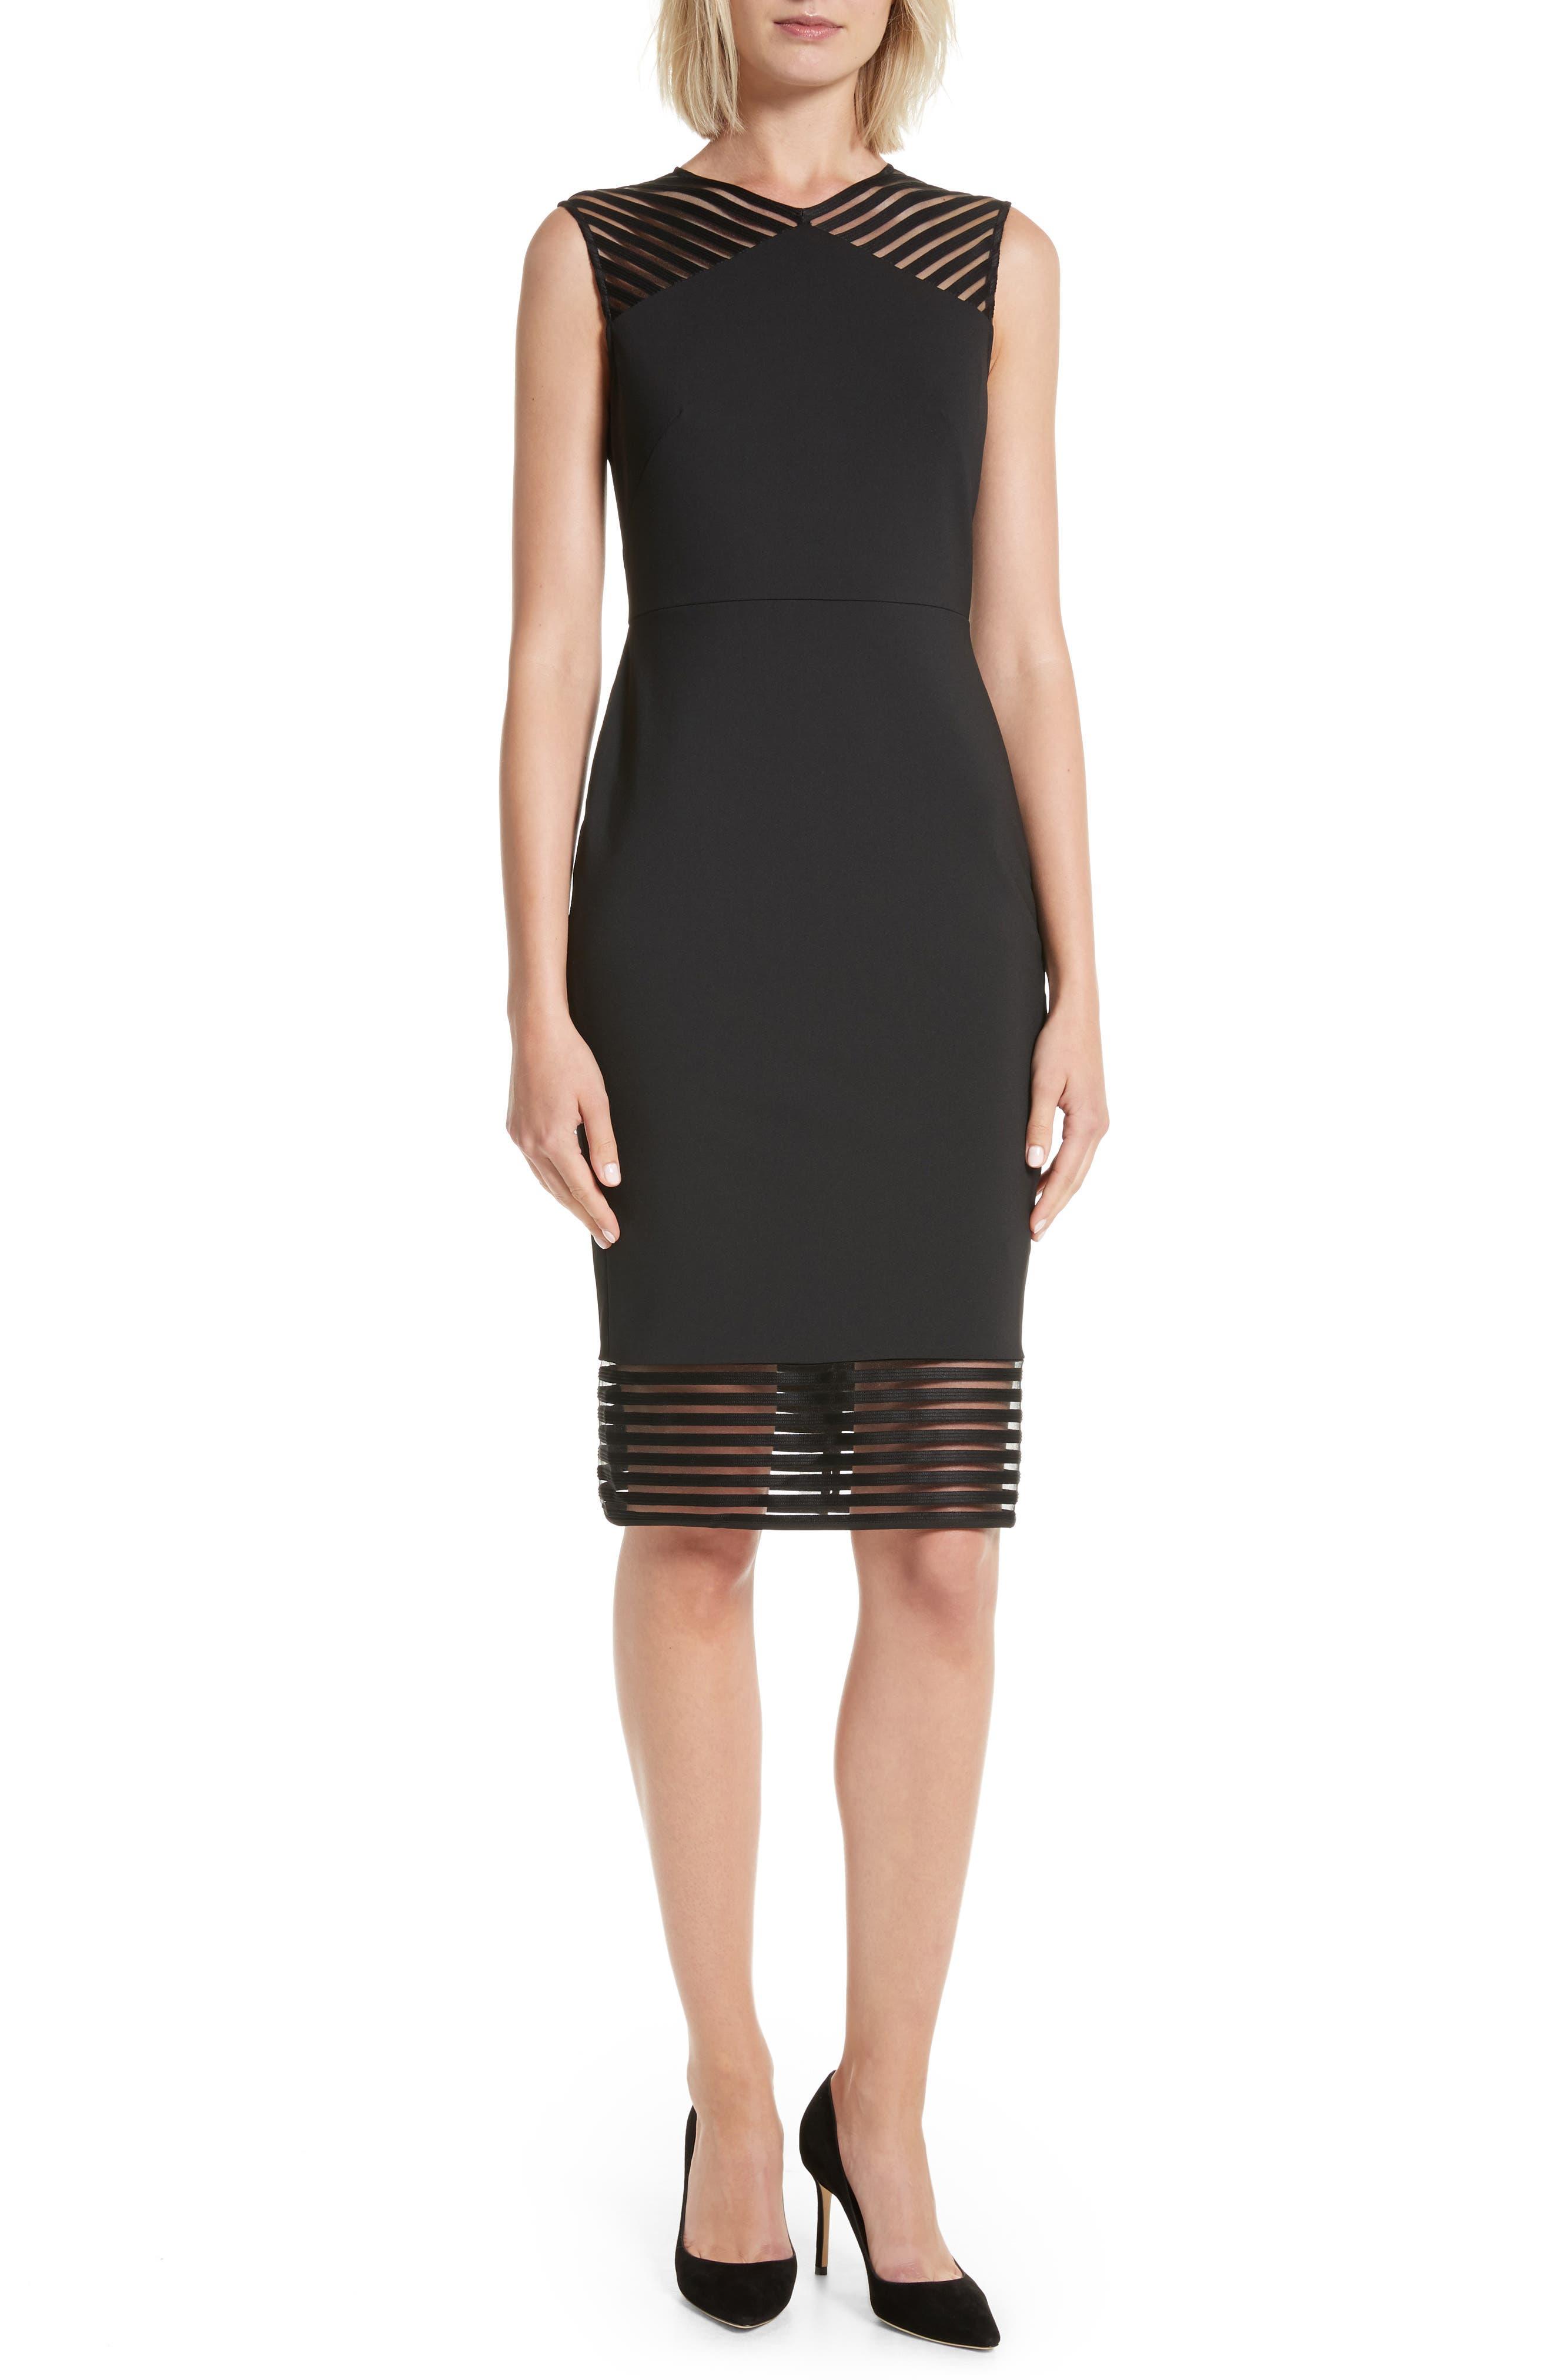 TED BAKER LONDON Lucette Mesh Detail Body Con Dress, Main, color, 001